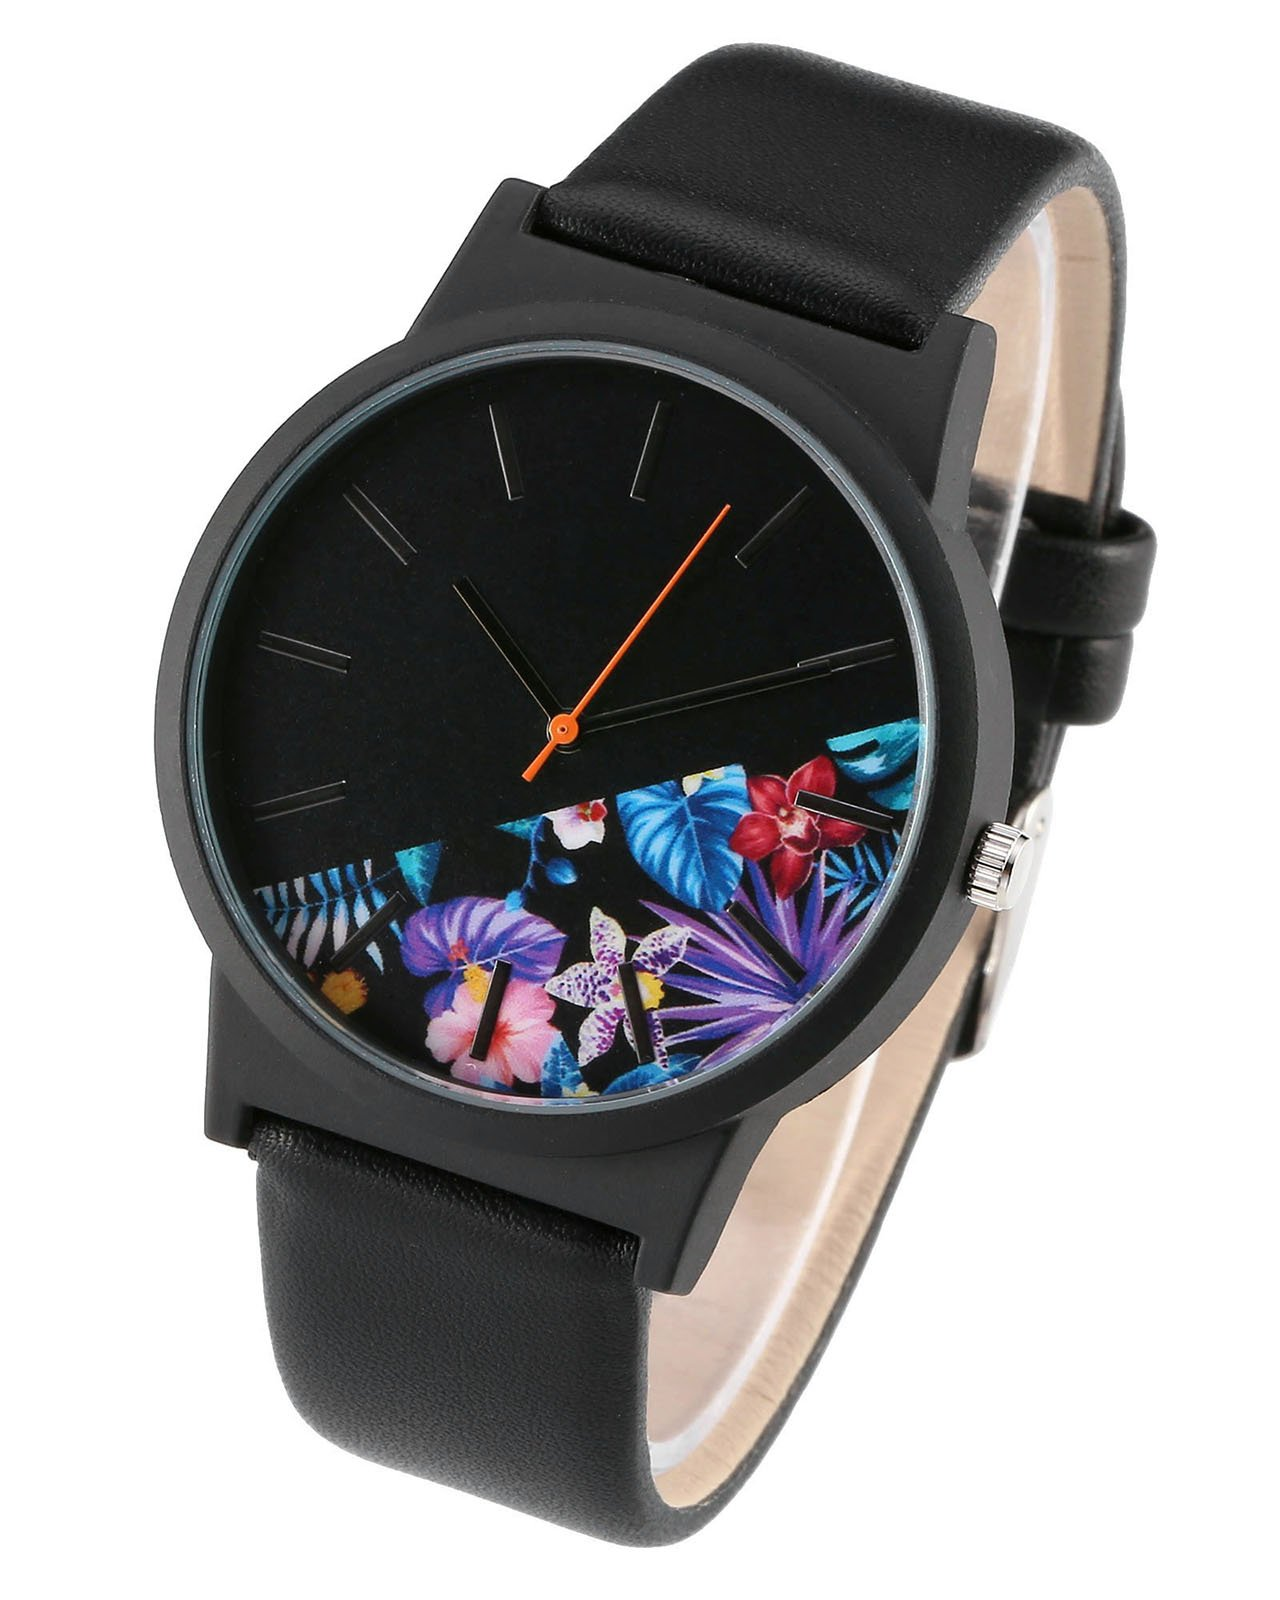 JSDDE Uhren,Vintage Klassische Blumen Armbanduhr Basel-Stil Damen Uhr PU Lederband Analog Quarzuhr,Schwarz